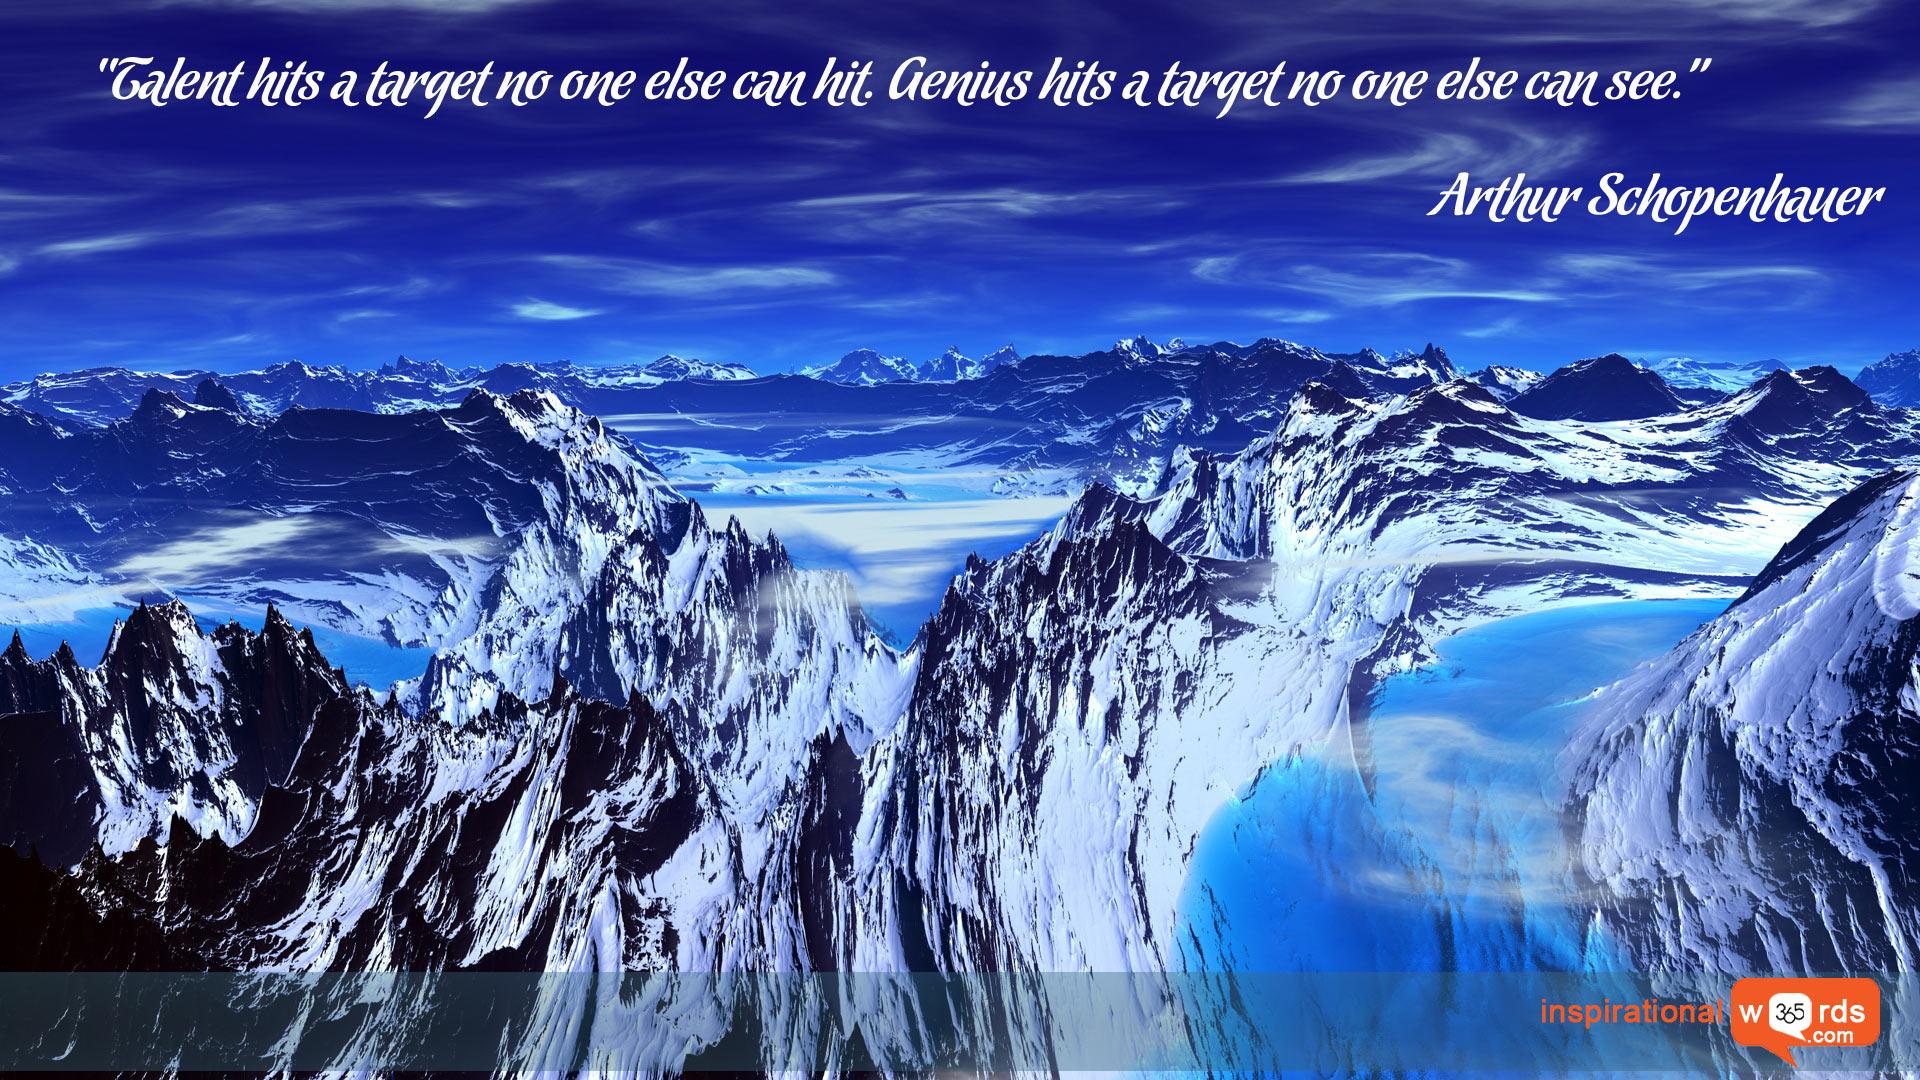 Inspirational Wallpaper Quote by Arthur Schopenhauer